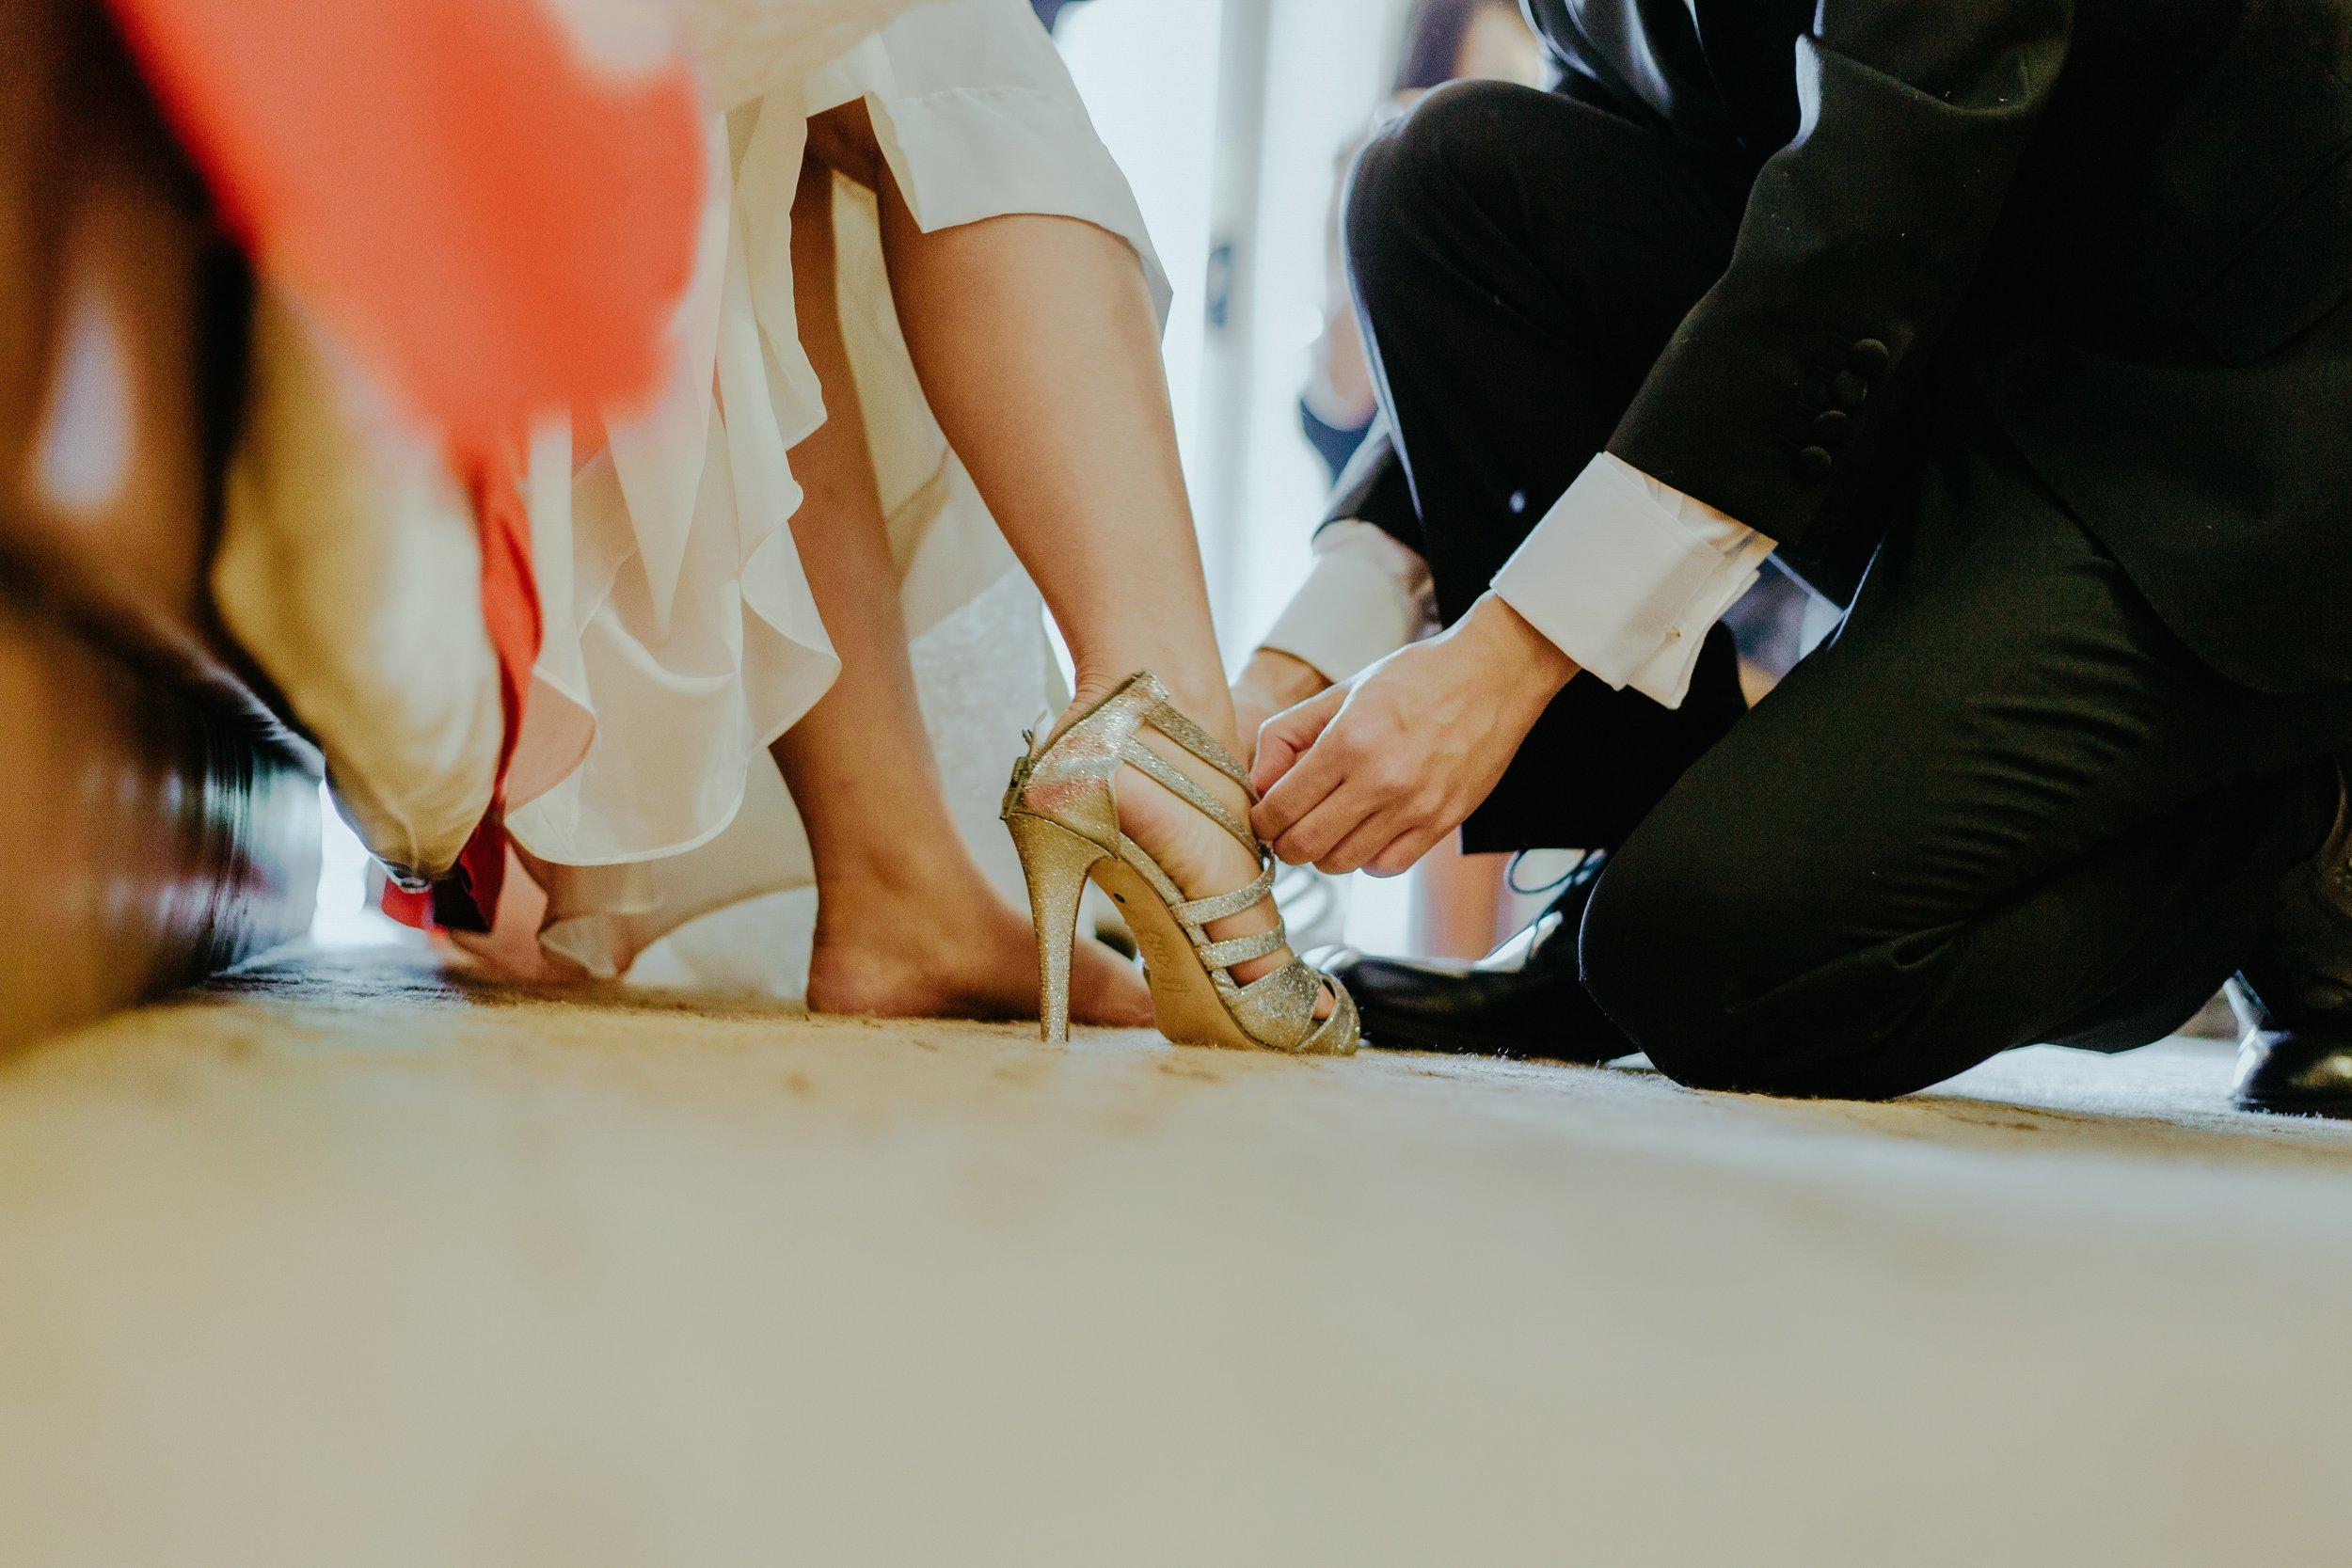 jeremy-wong-weddings-635248-unsplash.jpg